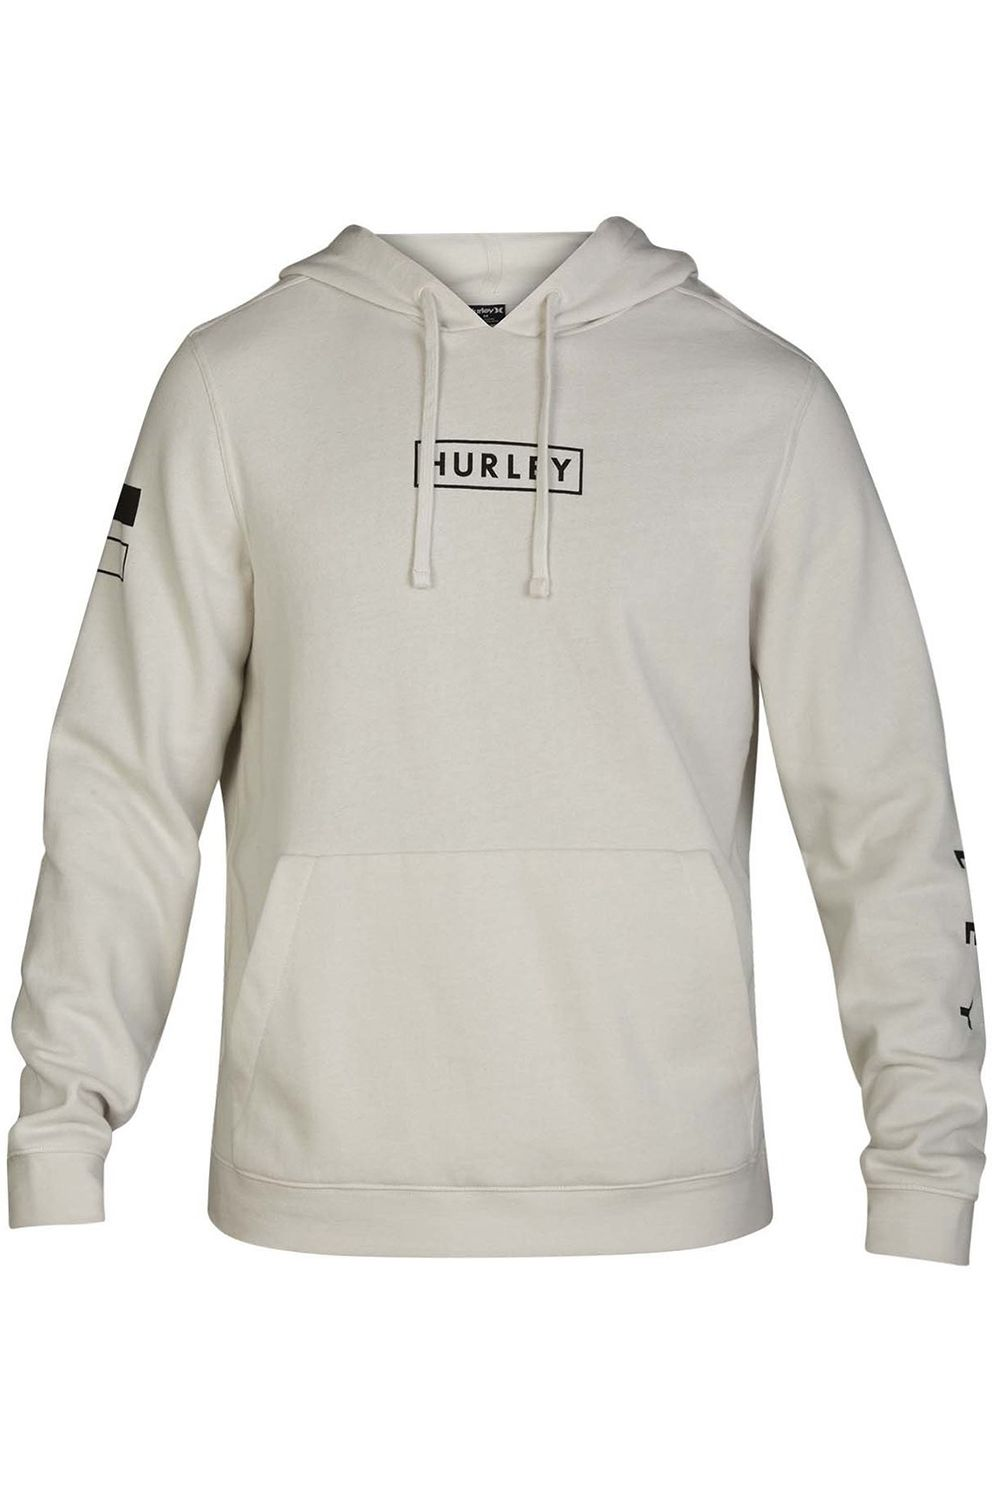 Hurley Sweat Hood FRAGMENT Light Bone